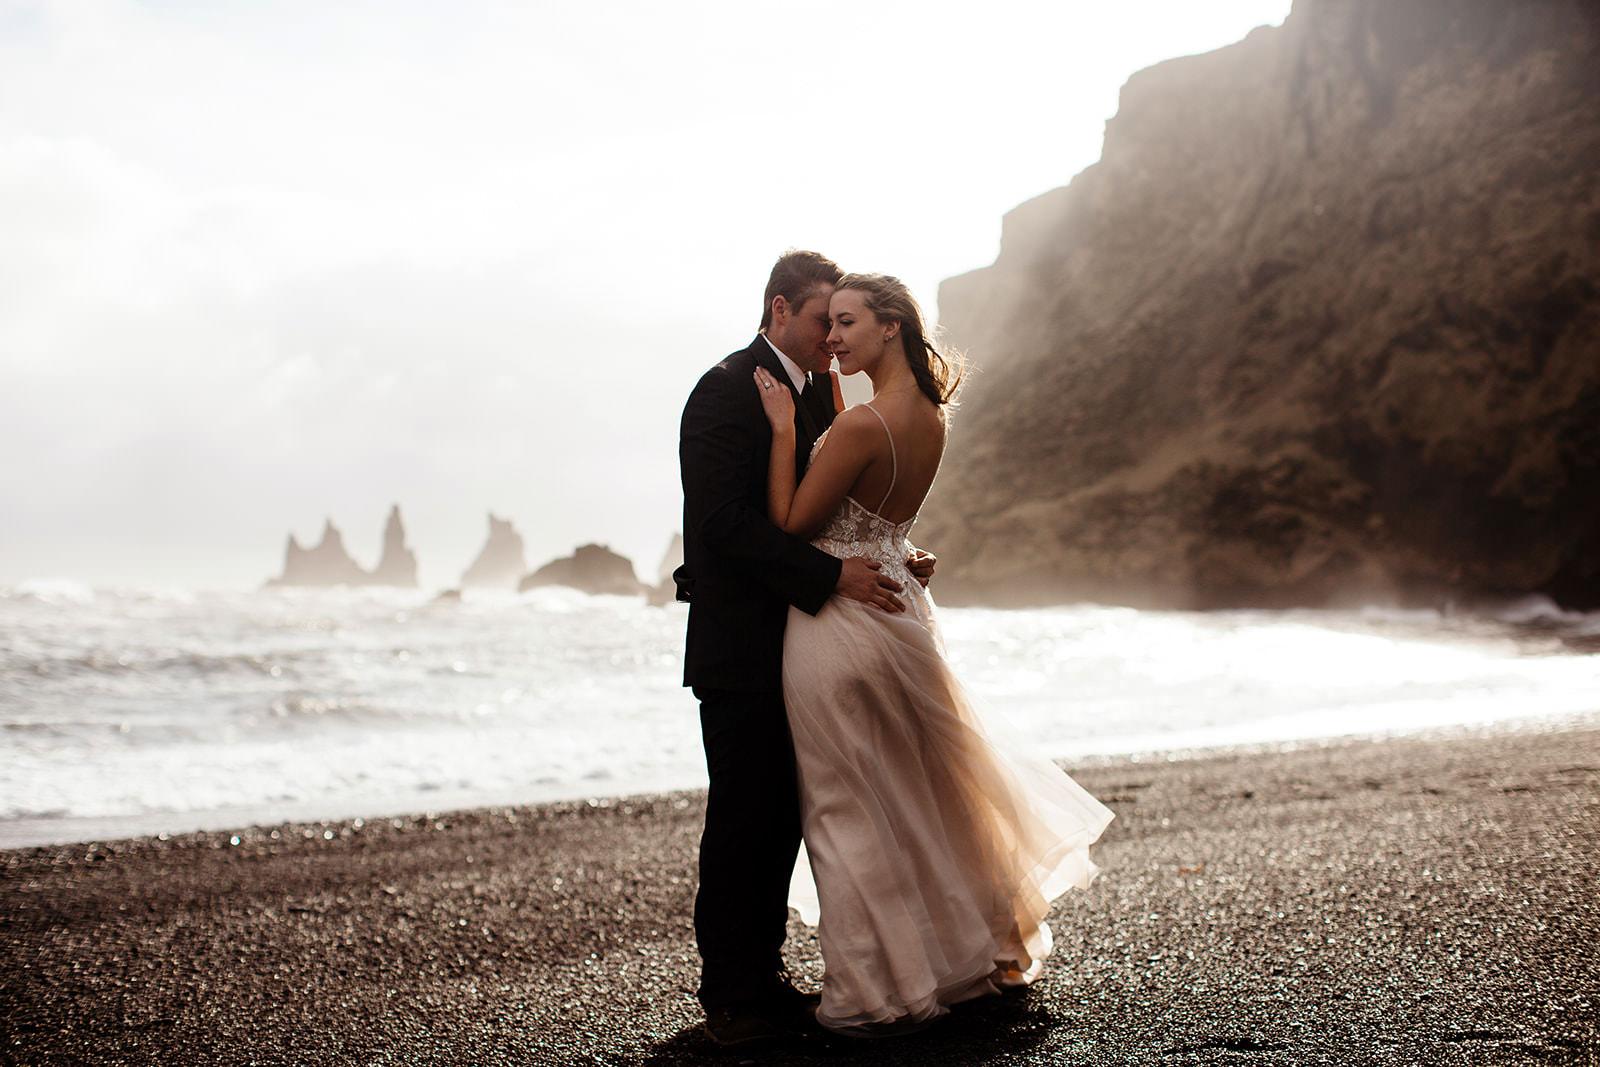 Icelandic Iceland Elopement Wedding Elope Photographer Eloping Reykjavík Vik Black Sand Beach Jökulsárlón Skogafoss Waterfall Vestrahorn Mountain Liz Osban Photography Destination 76.jpg